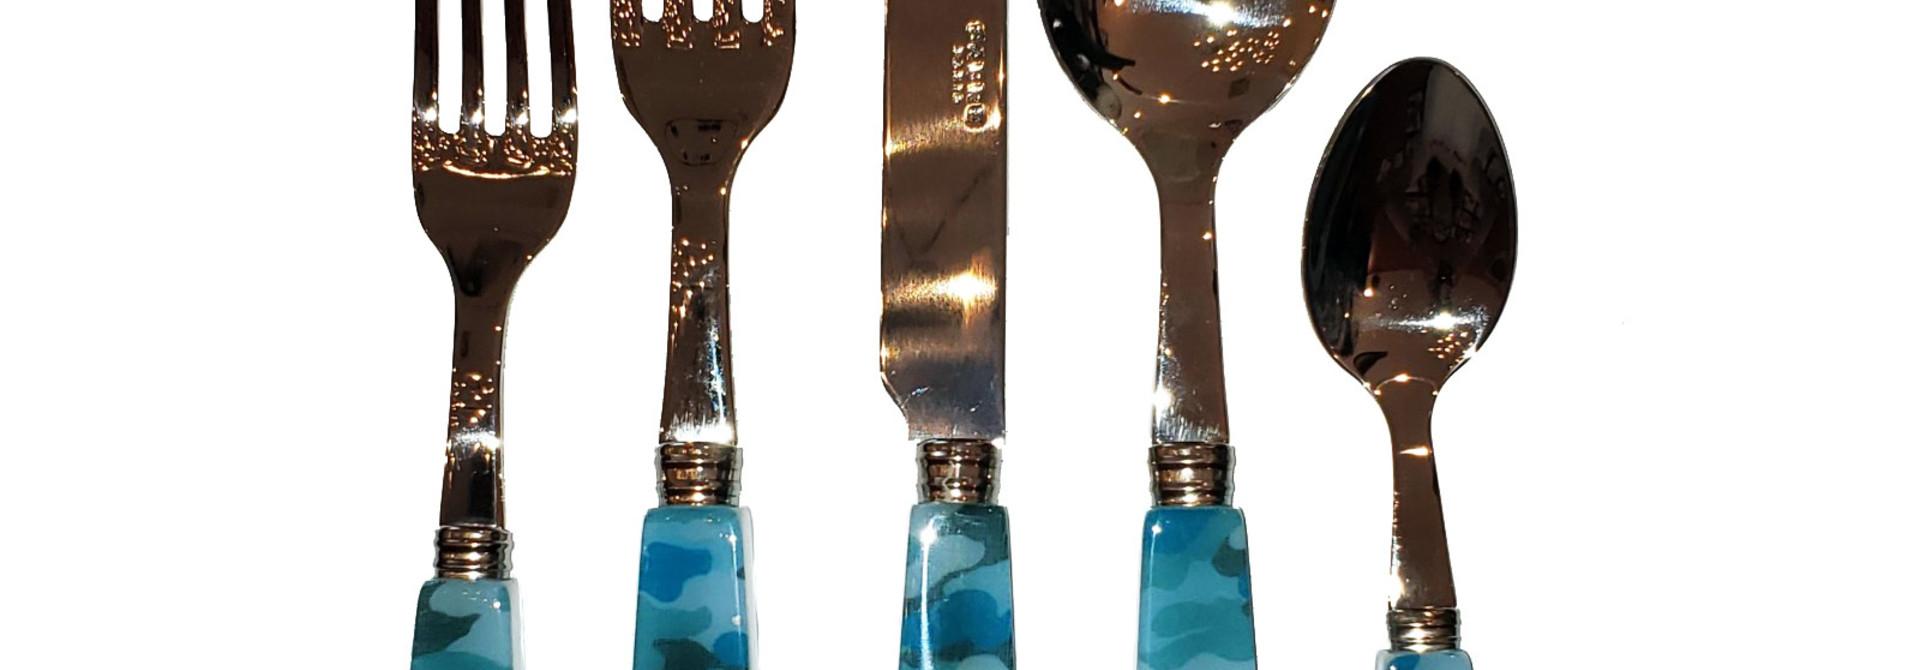 Camo 5 Pc Setting - Turquoise - Set of 6